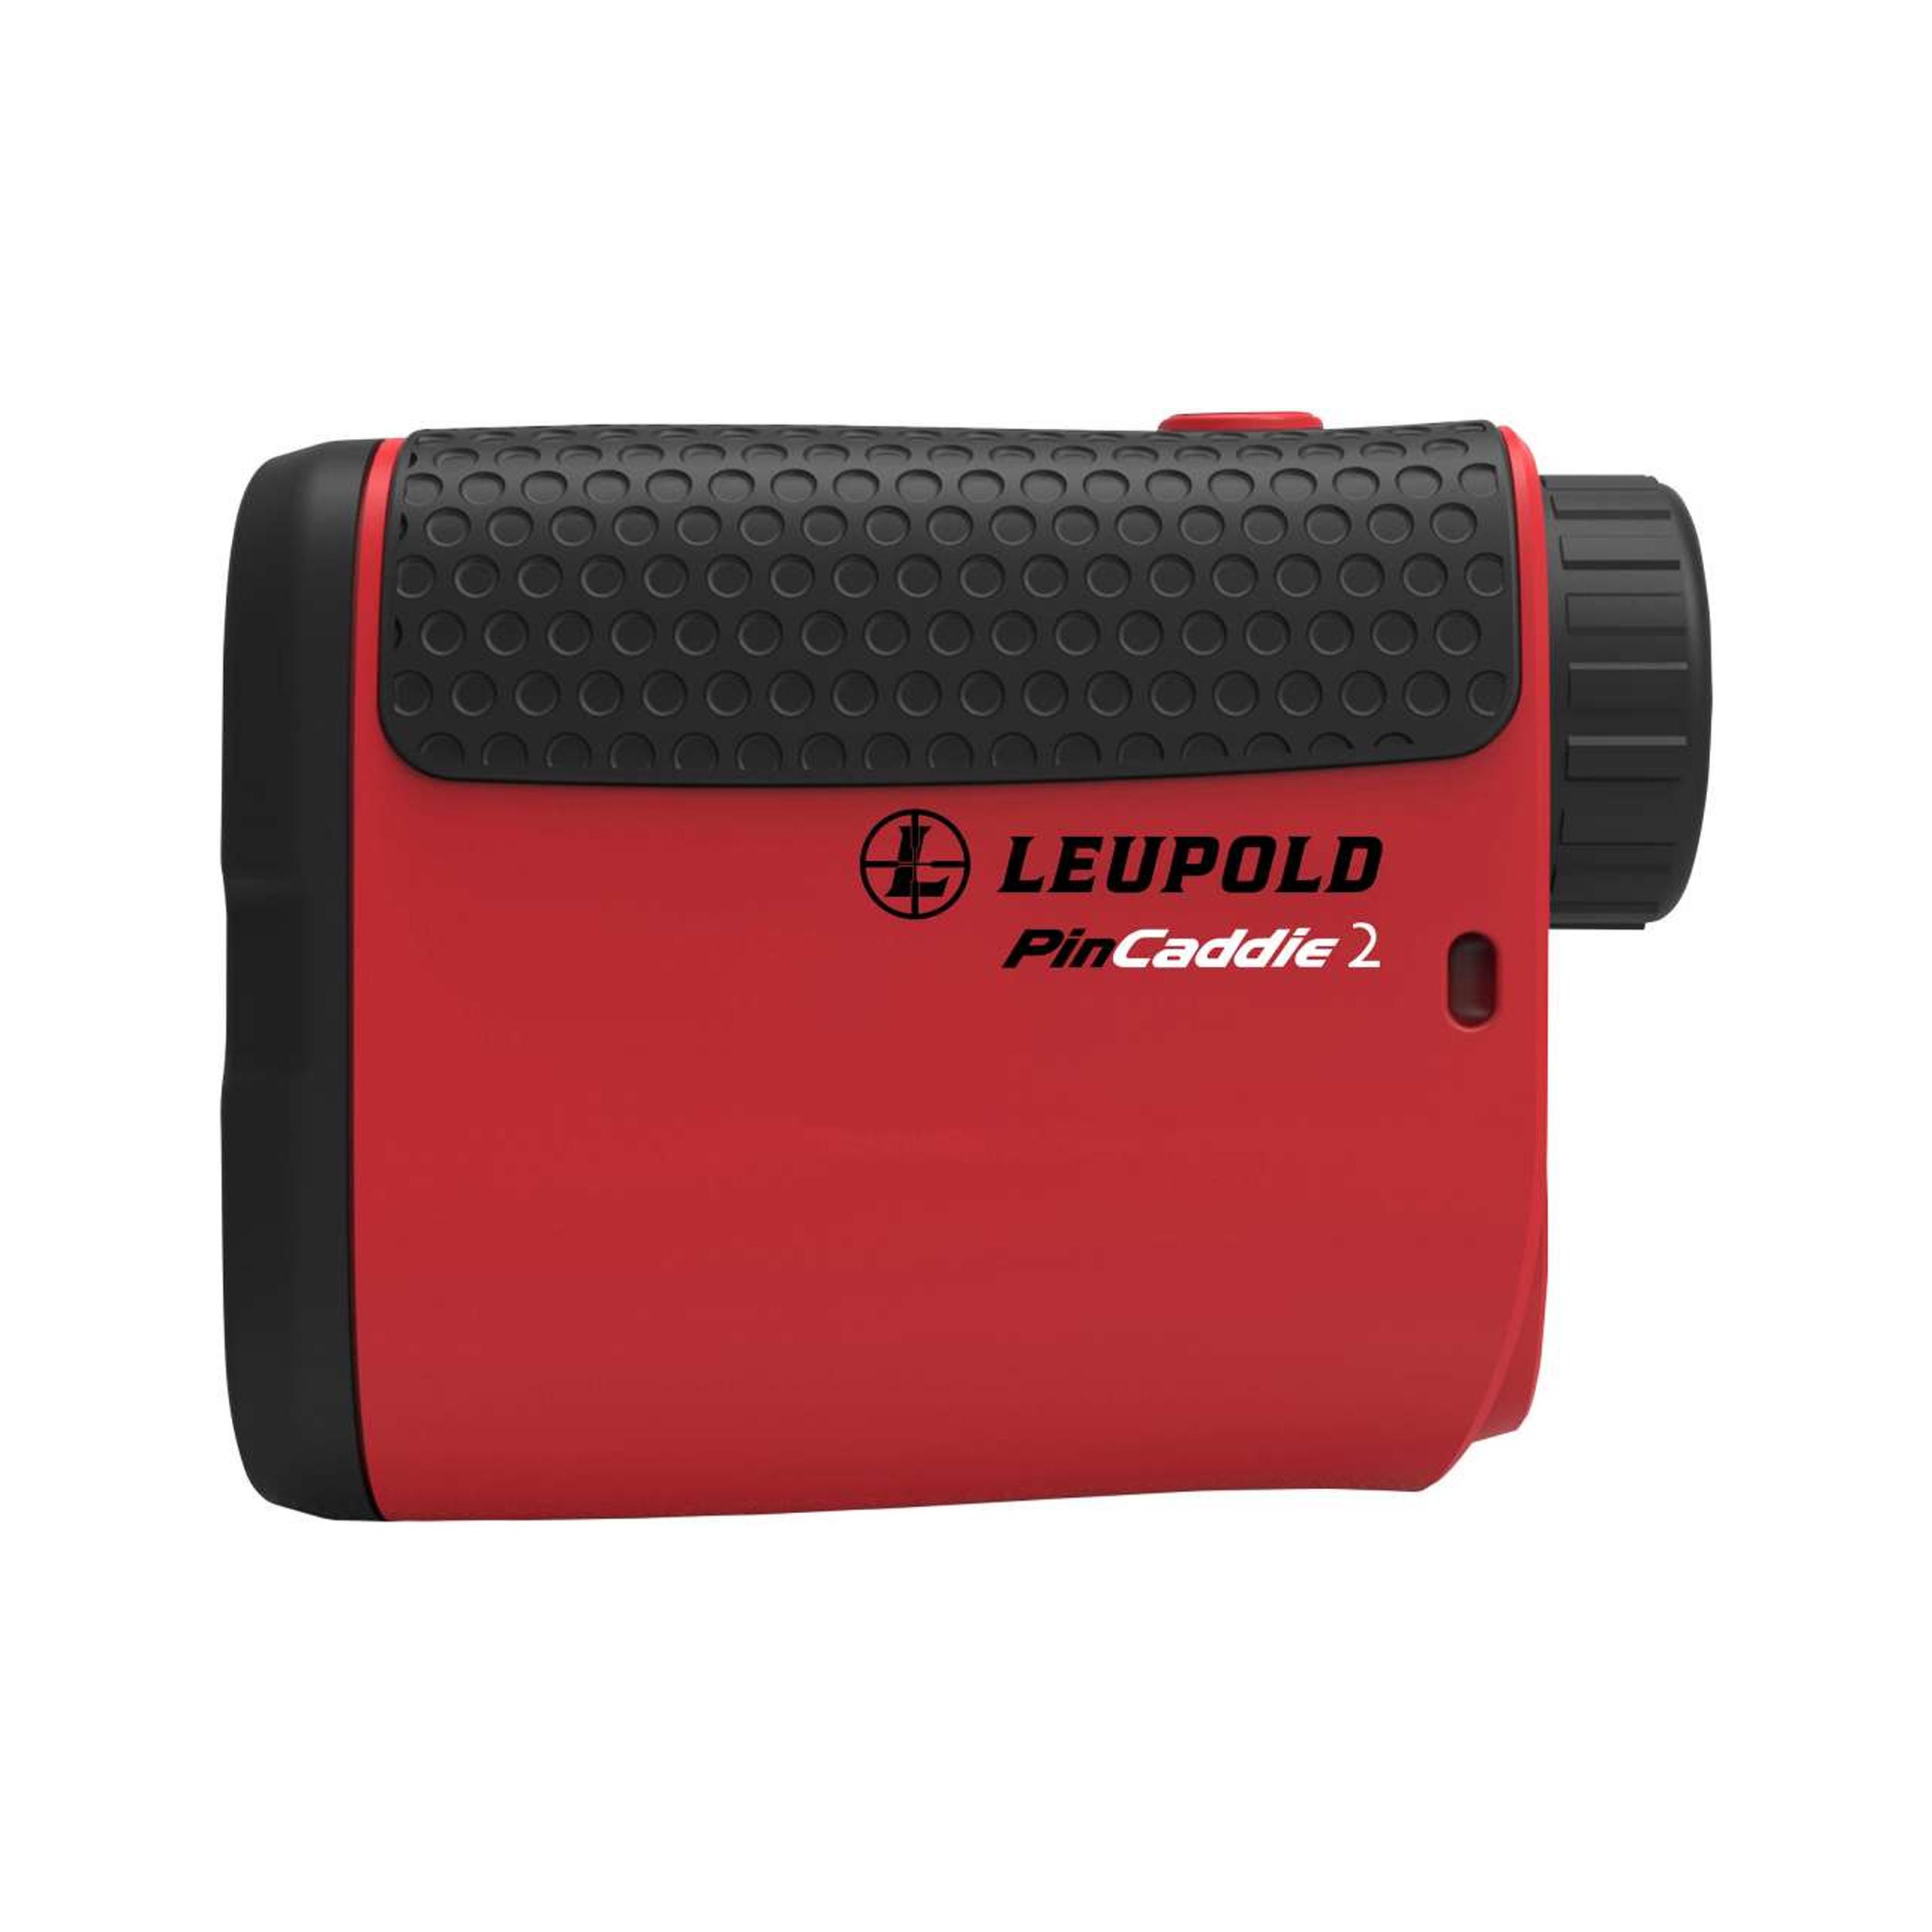 Leupold Golf PinCaddie II Golf Rangefinding Monocular